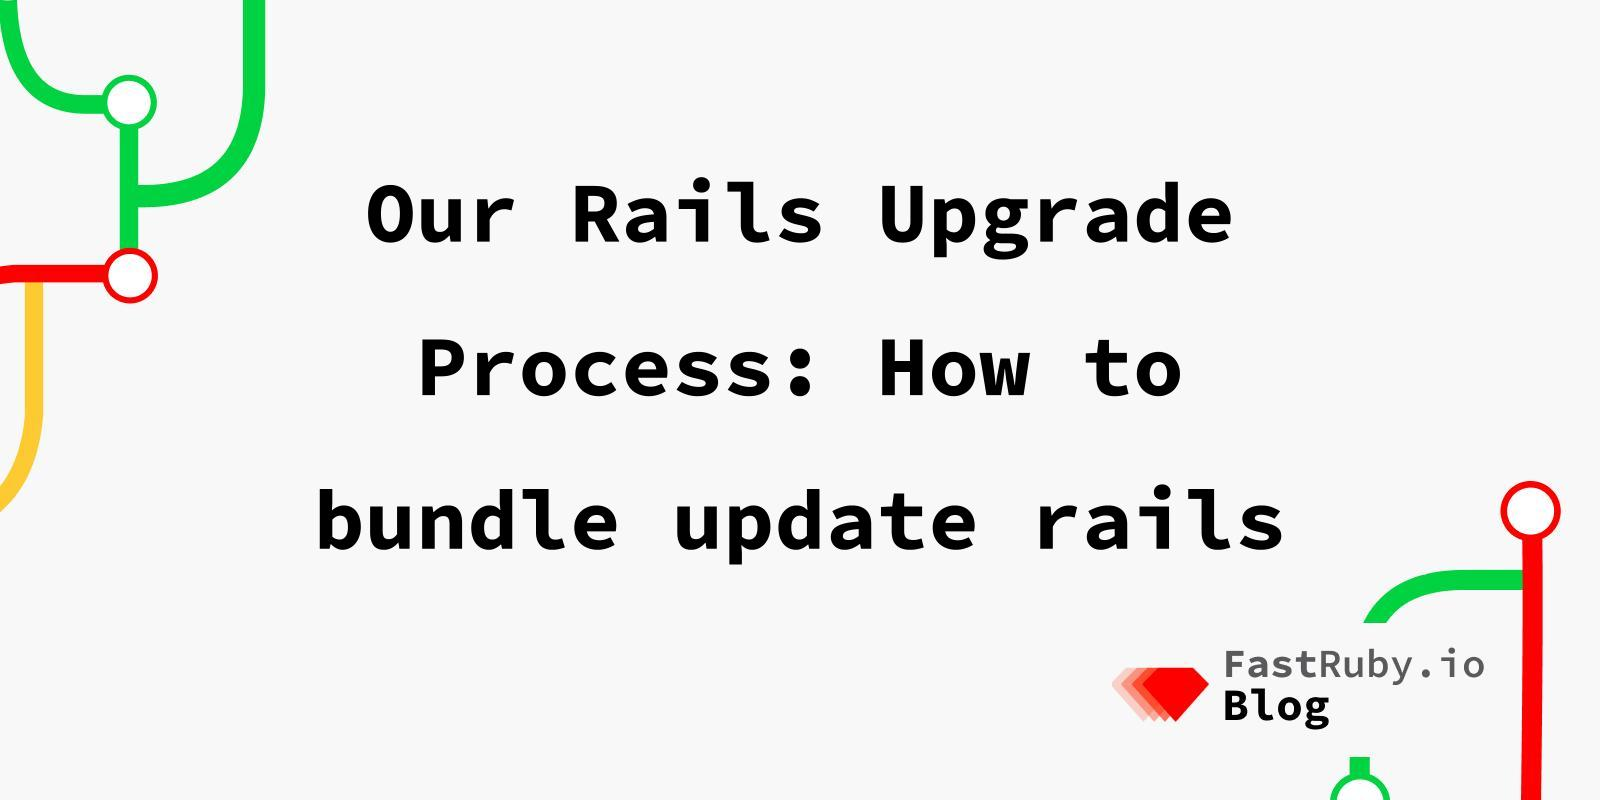 Updating rails filipino kisses dating site